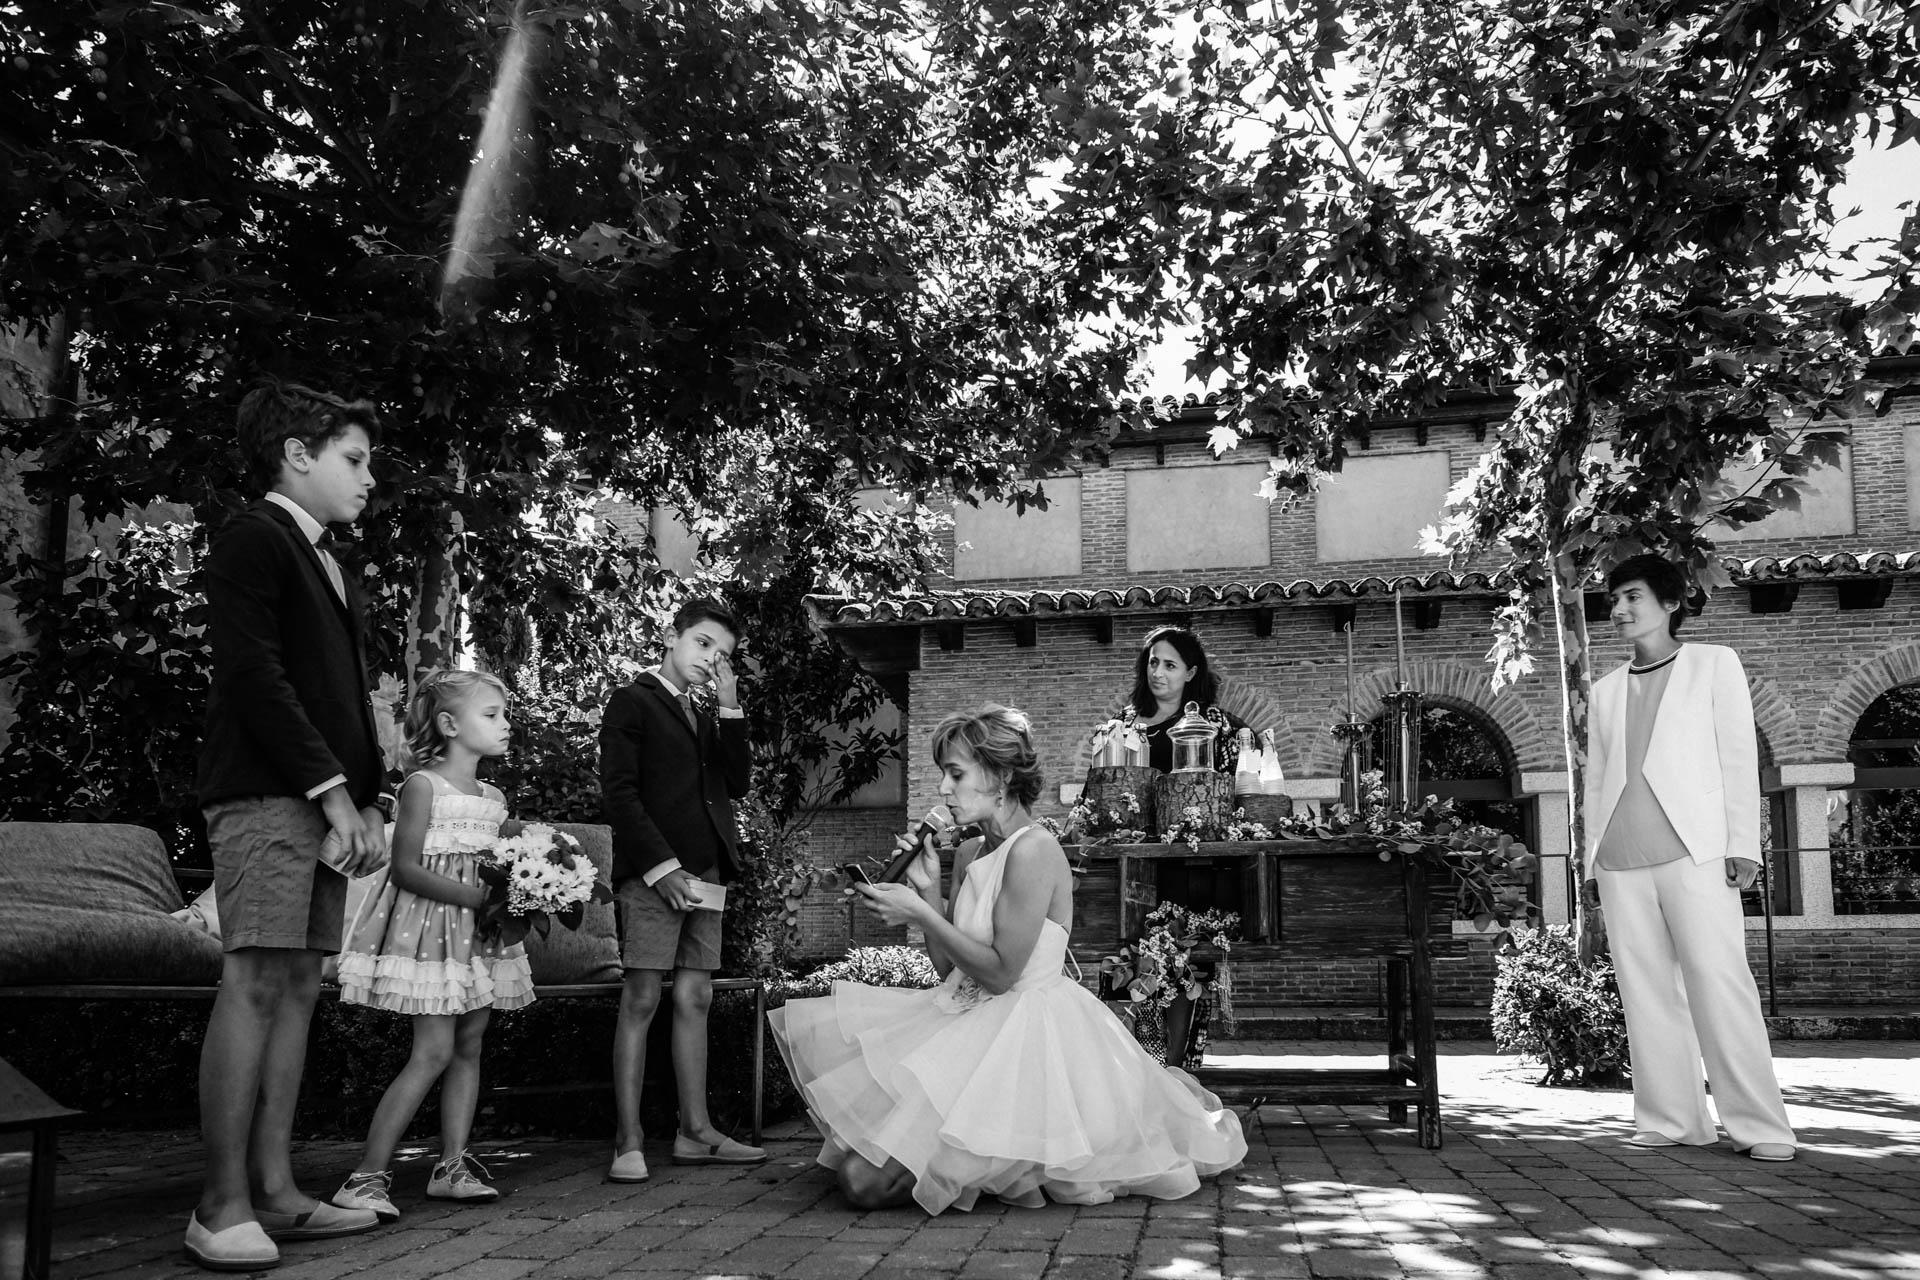 two girls wedding ceremony